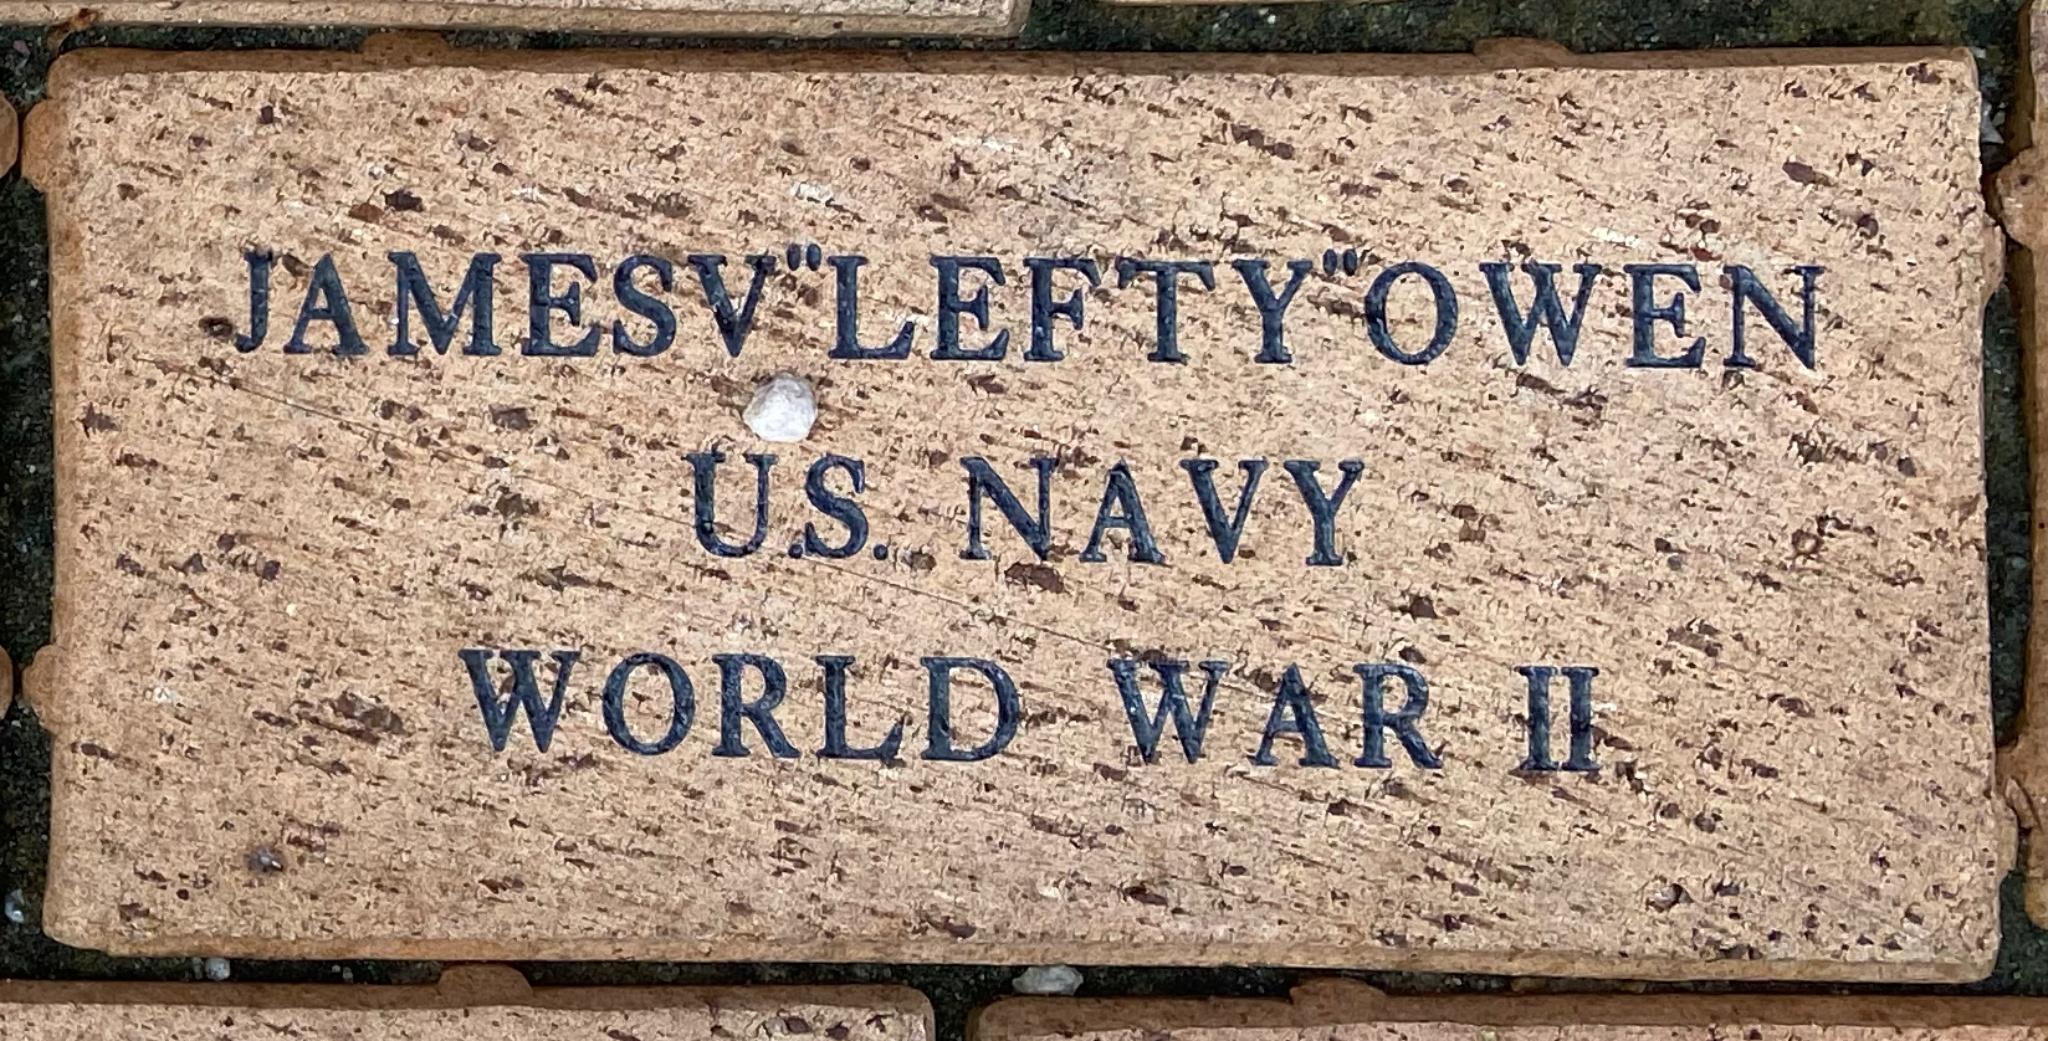 "JAMESV""LEFTY""""OWEN U.S. NAVY WORLD WAR II"